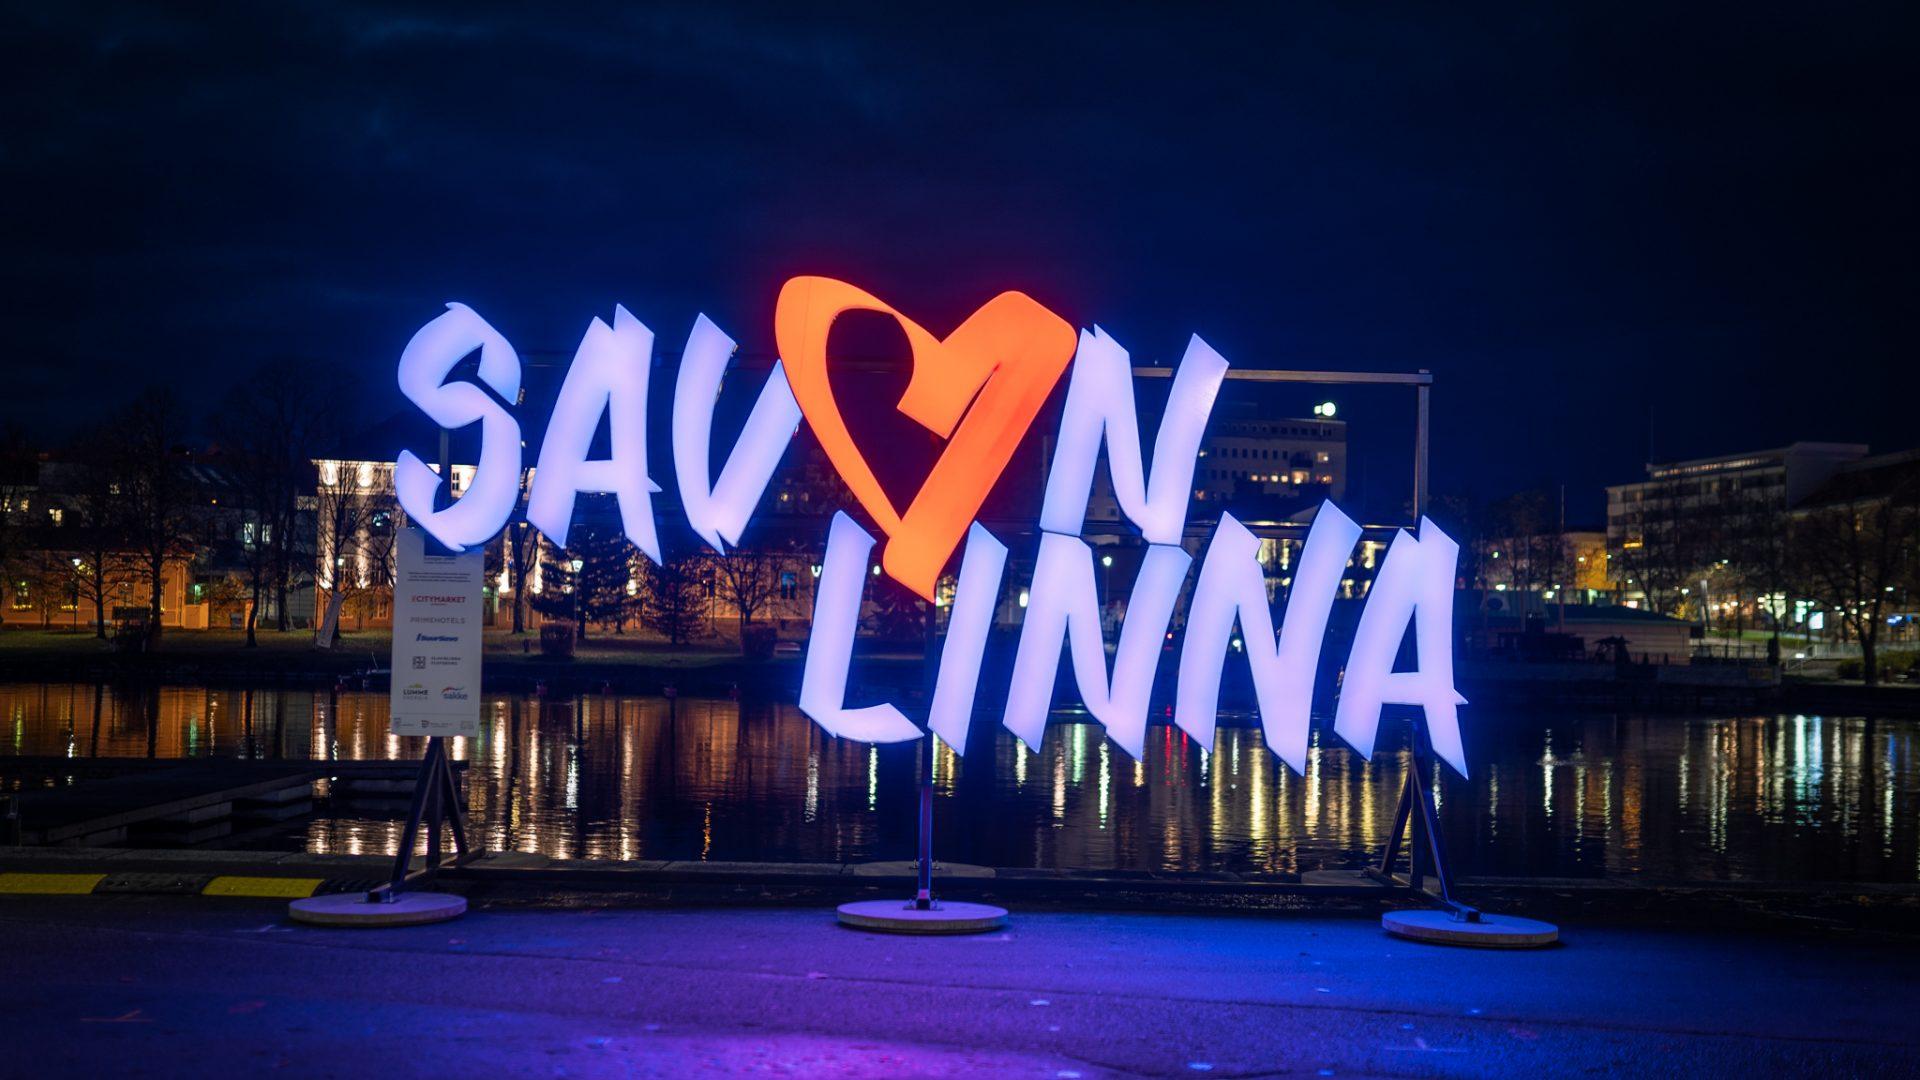 Savonlinna -valoteos